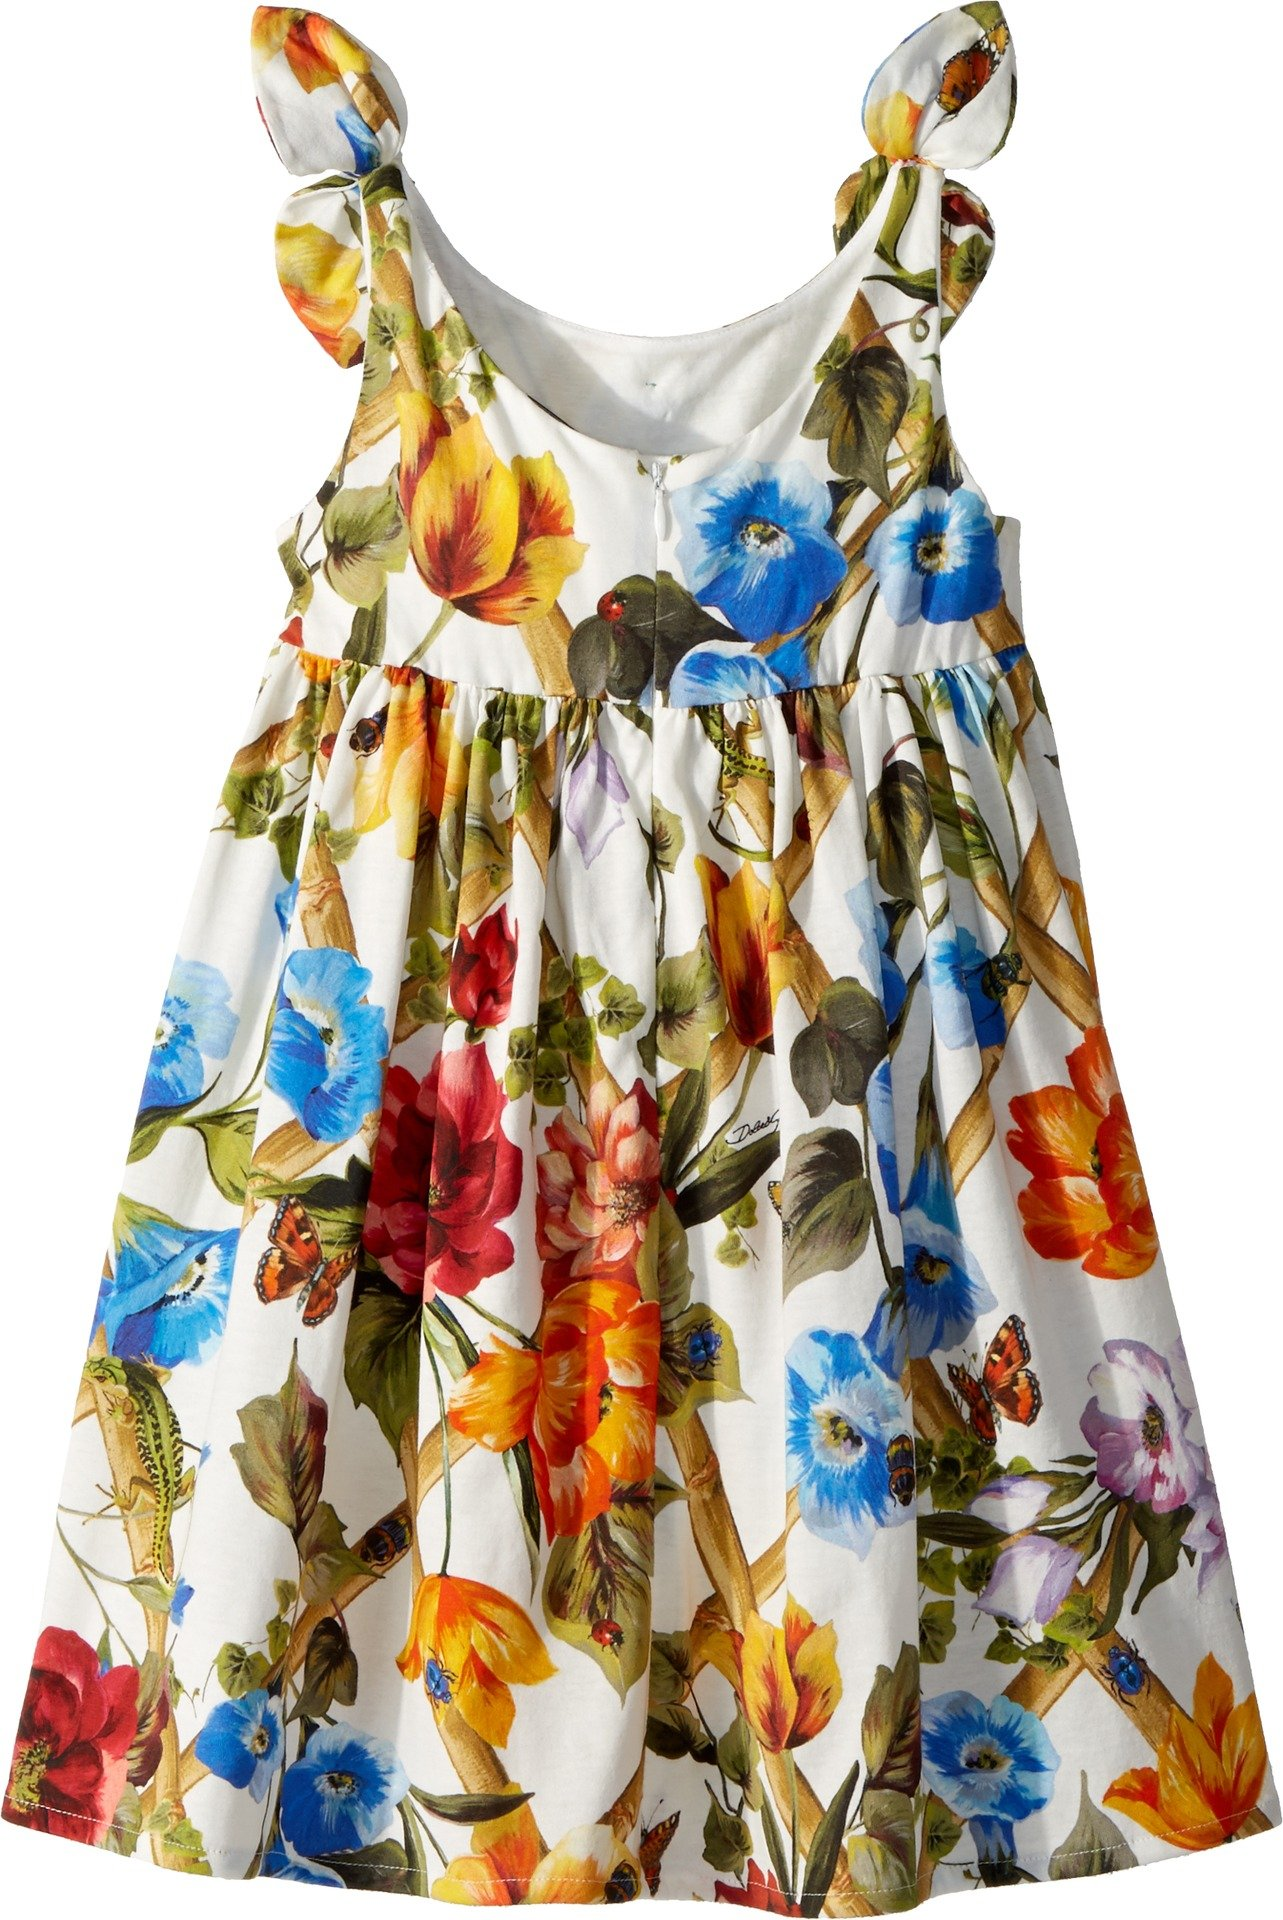 Dolce & Gabbana Kids Baby Girl's Sleeveless Dress (Toddler/Little Kids) White Print 5 by Dolce & Gabbana (Image #2)